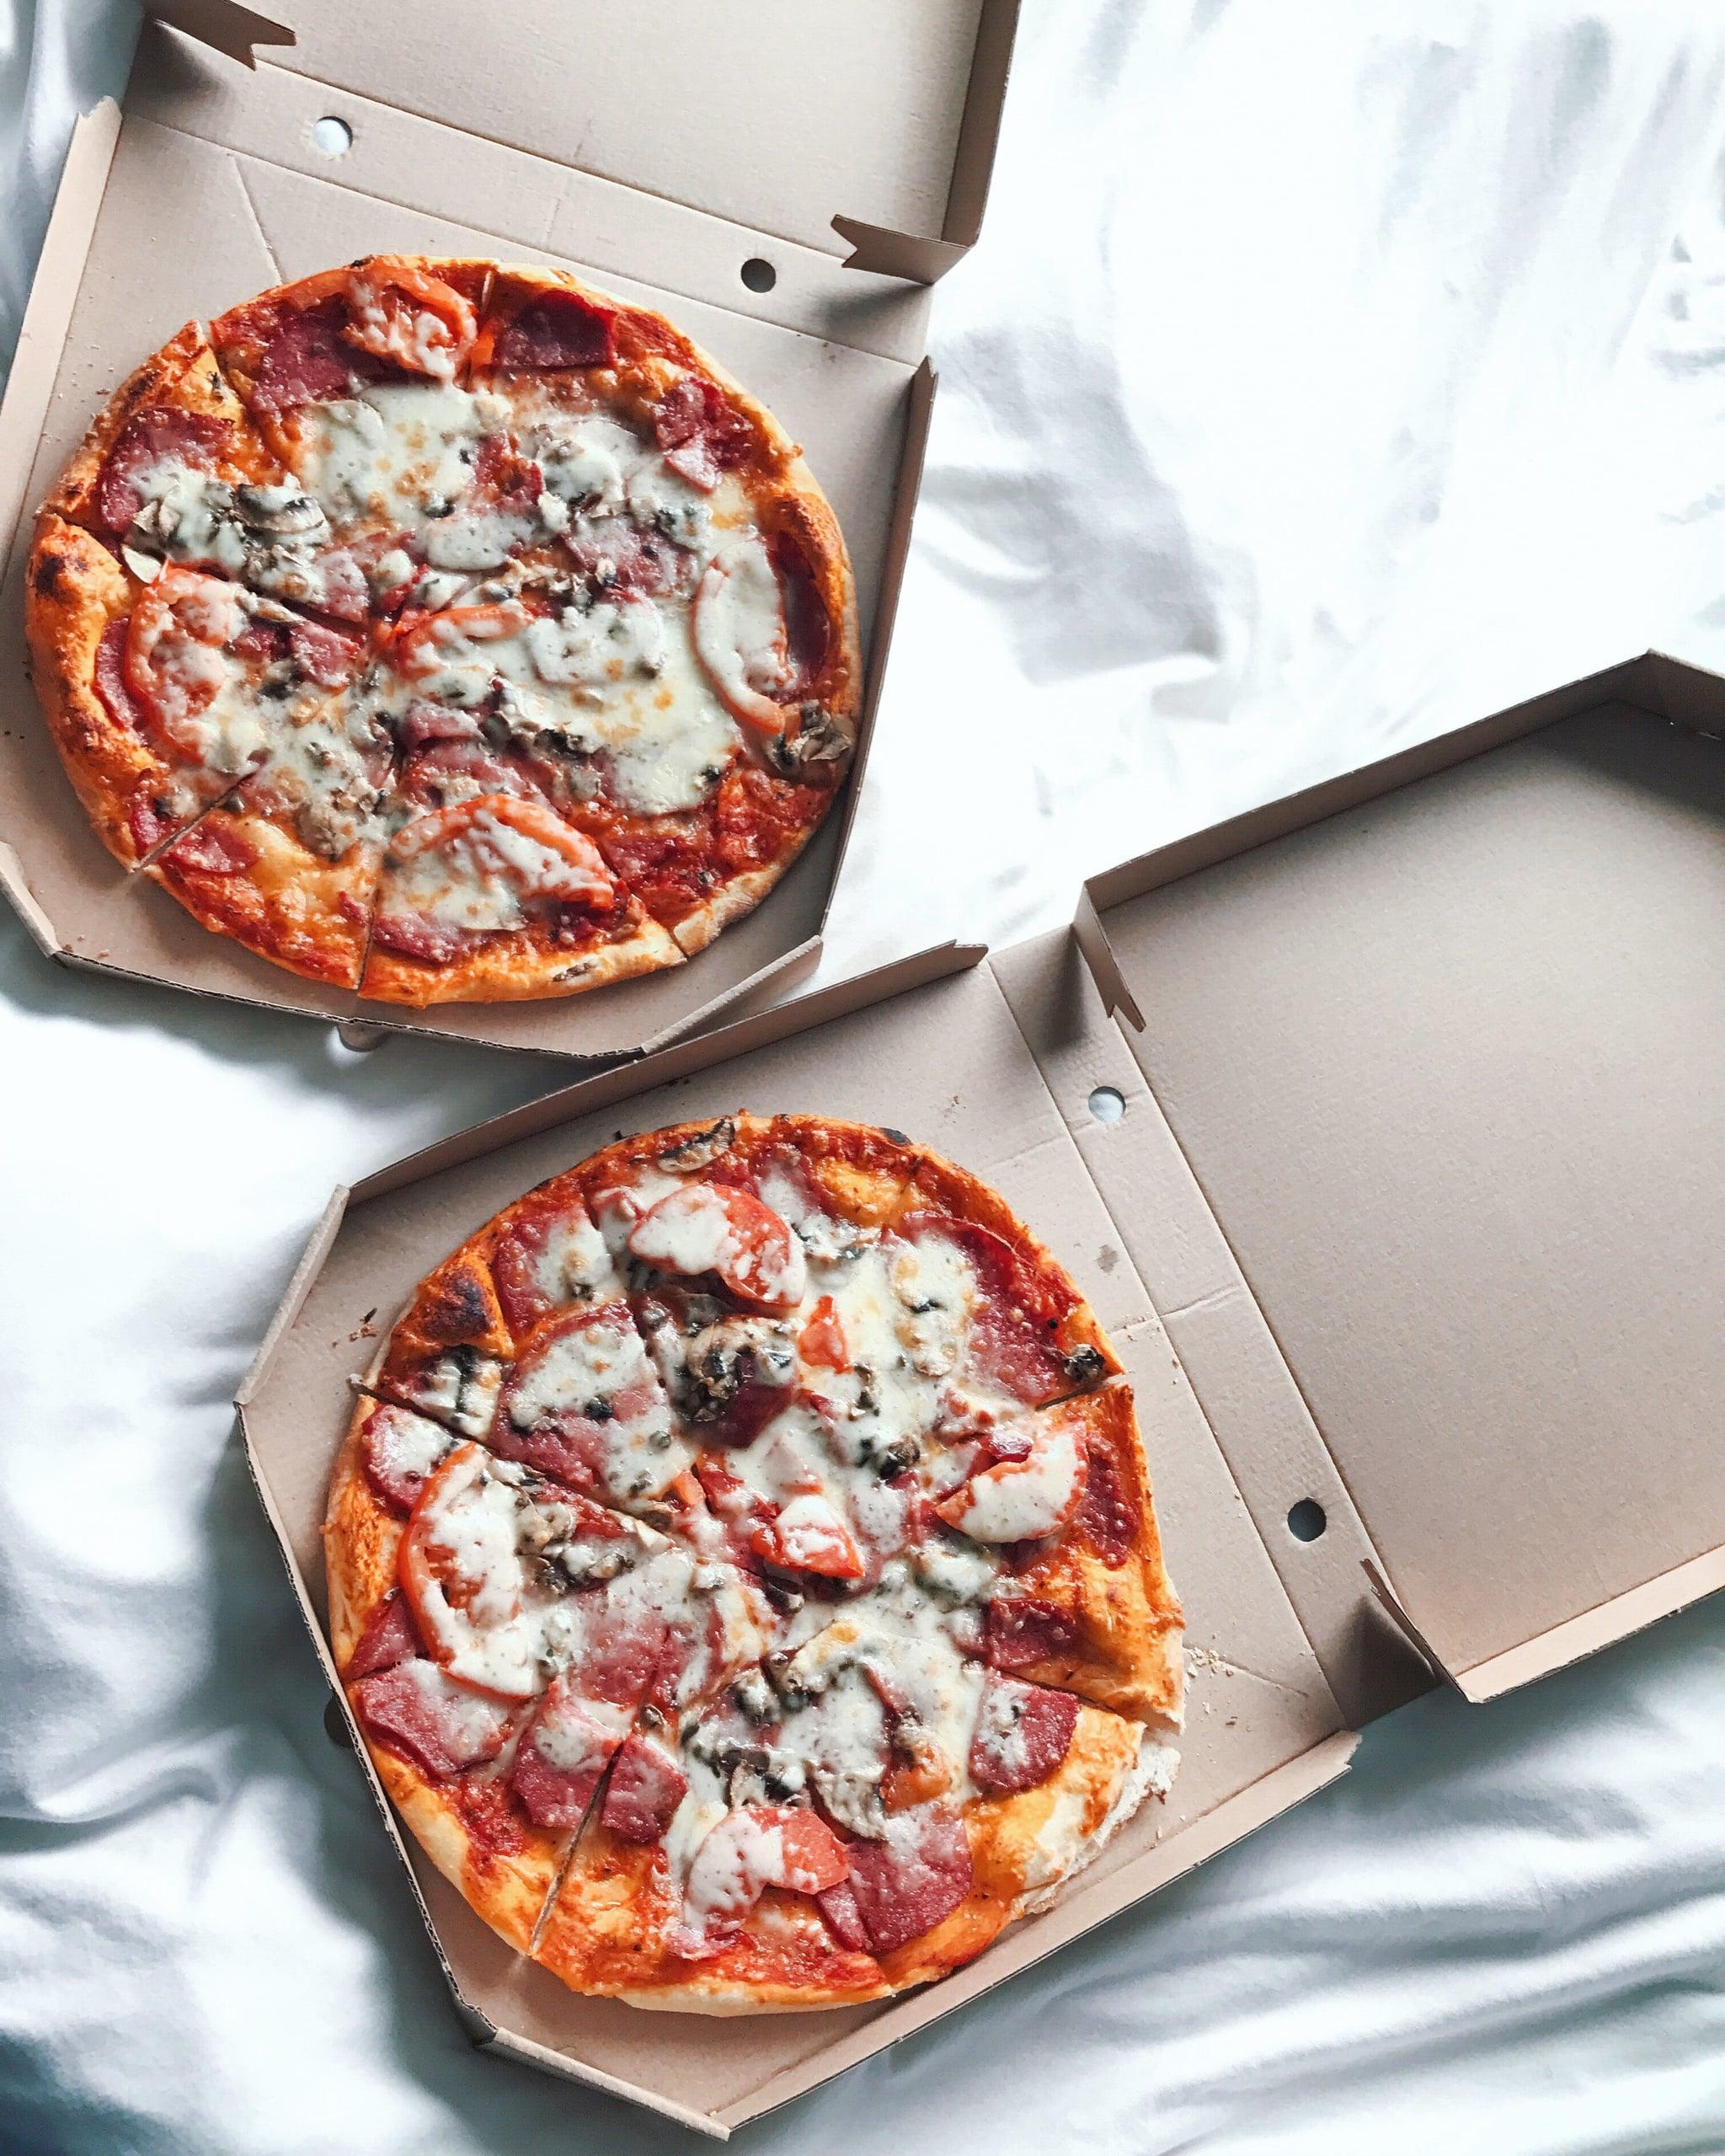 tmp_wf1vA3_0e8f3f4ef744ee66_pizza.jpg